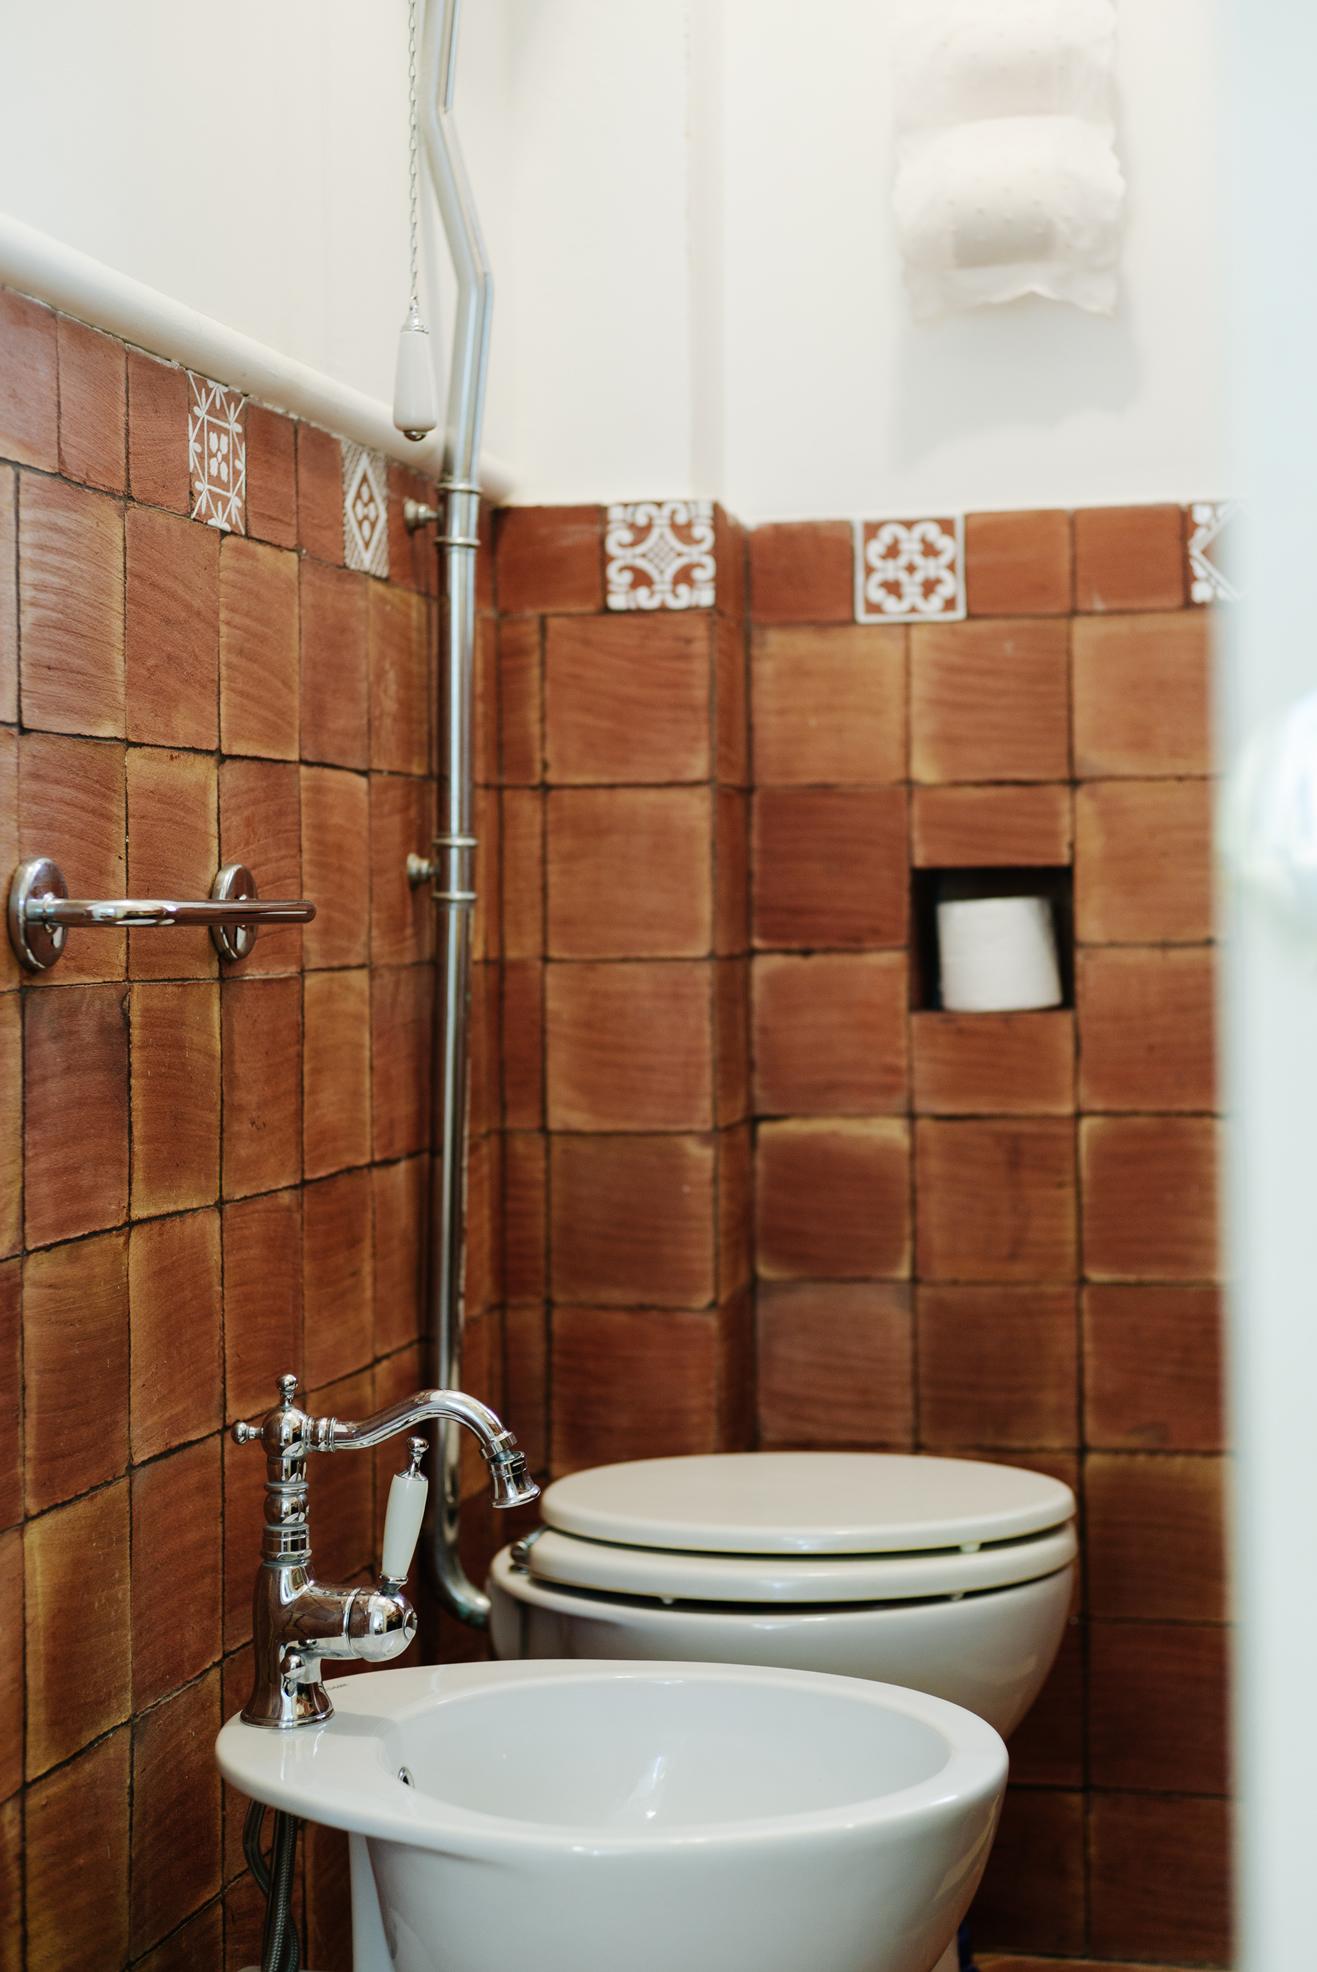 14sampieri-casa-vacanze-sicilia-appartamento-sicily-holiday-apartment-casa-del-pescatore-italia-italy.jpg